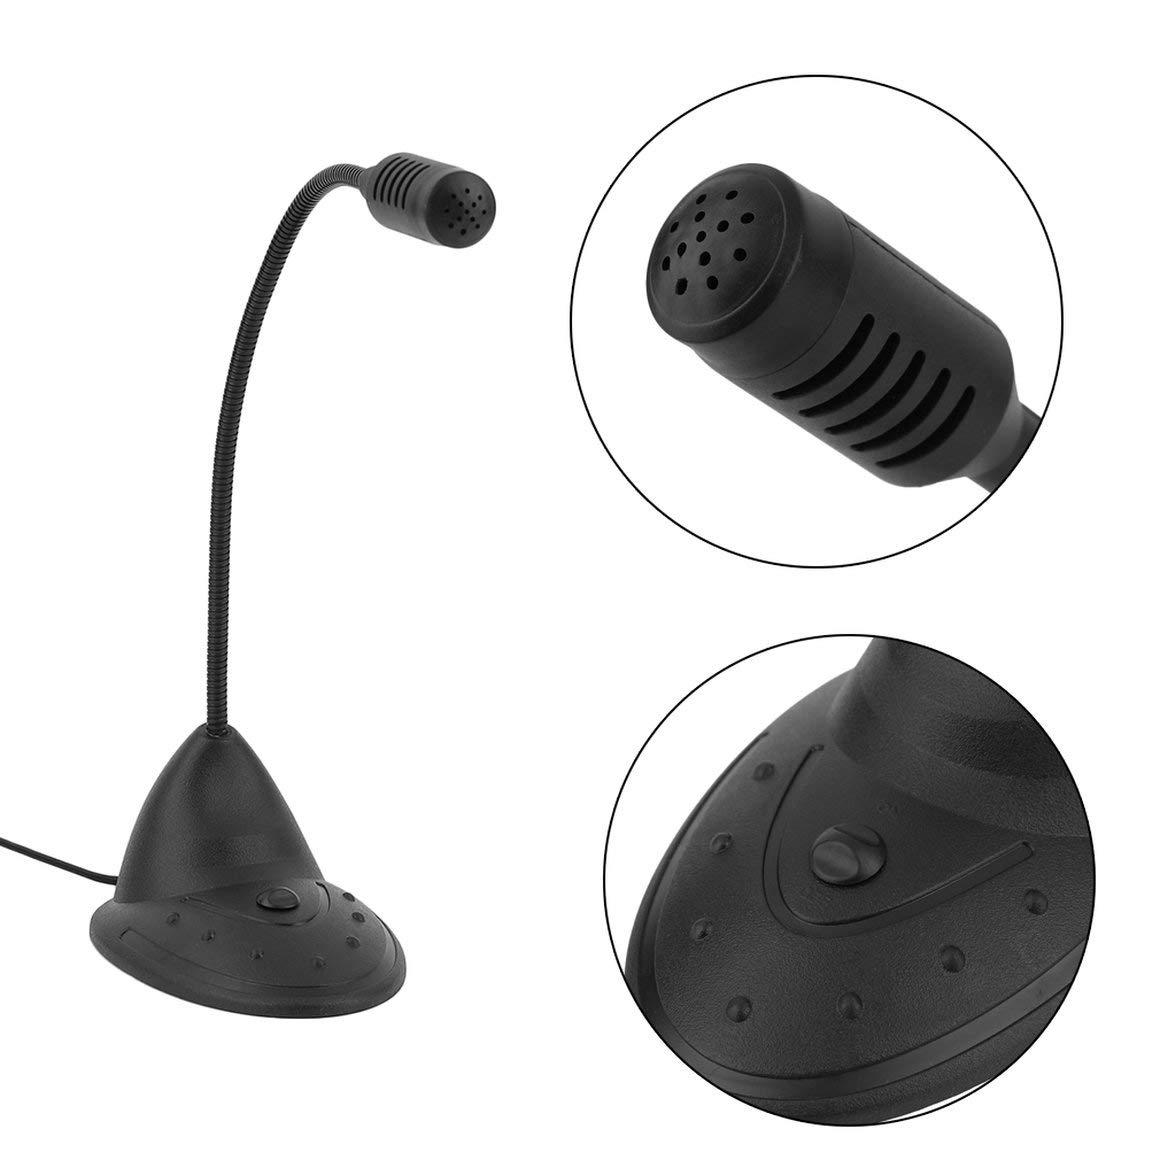 Funnyrunstore Desktop Microphone CD-2000 Small Practical Notebook Computer Microphone Studio Speech Mic Stand Holder For Pc Black